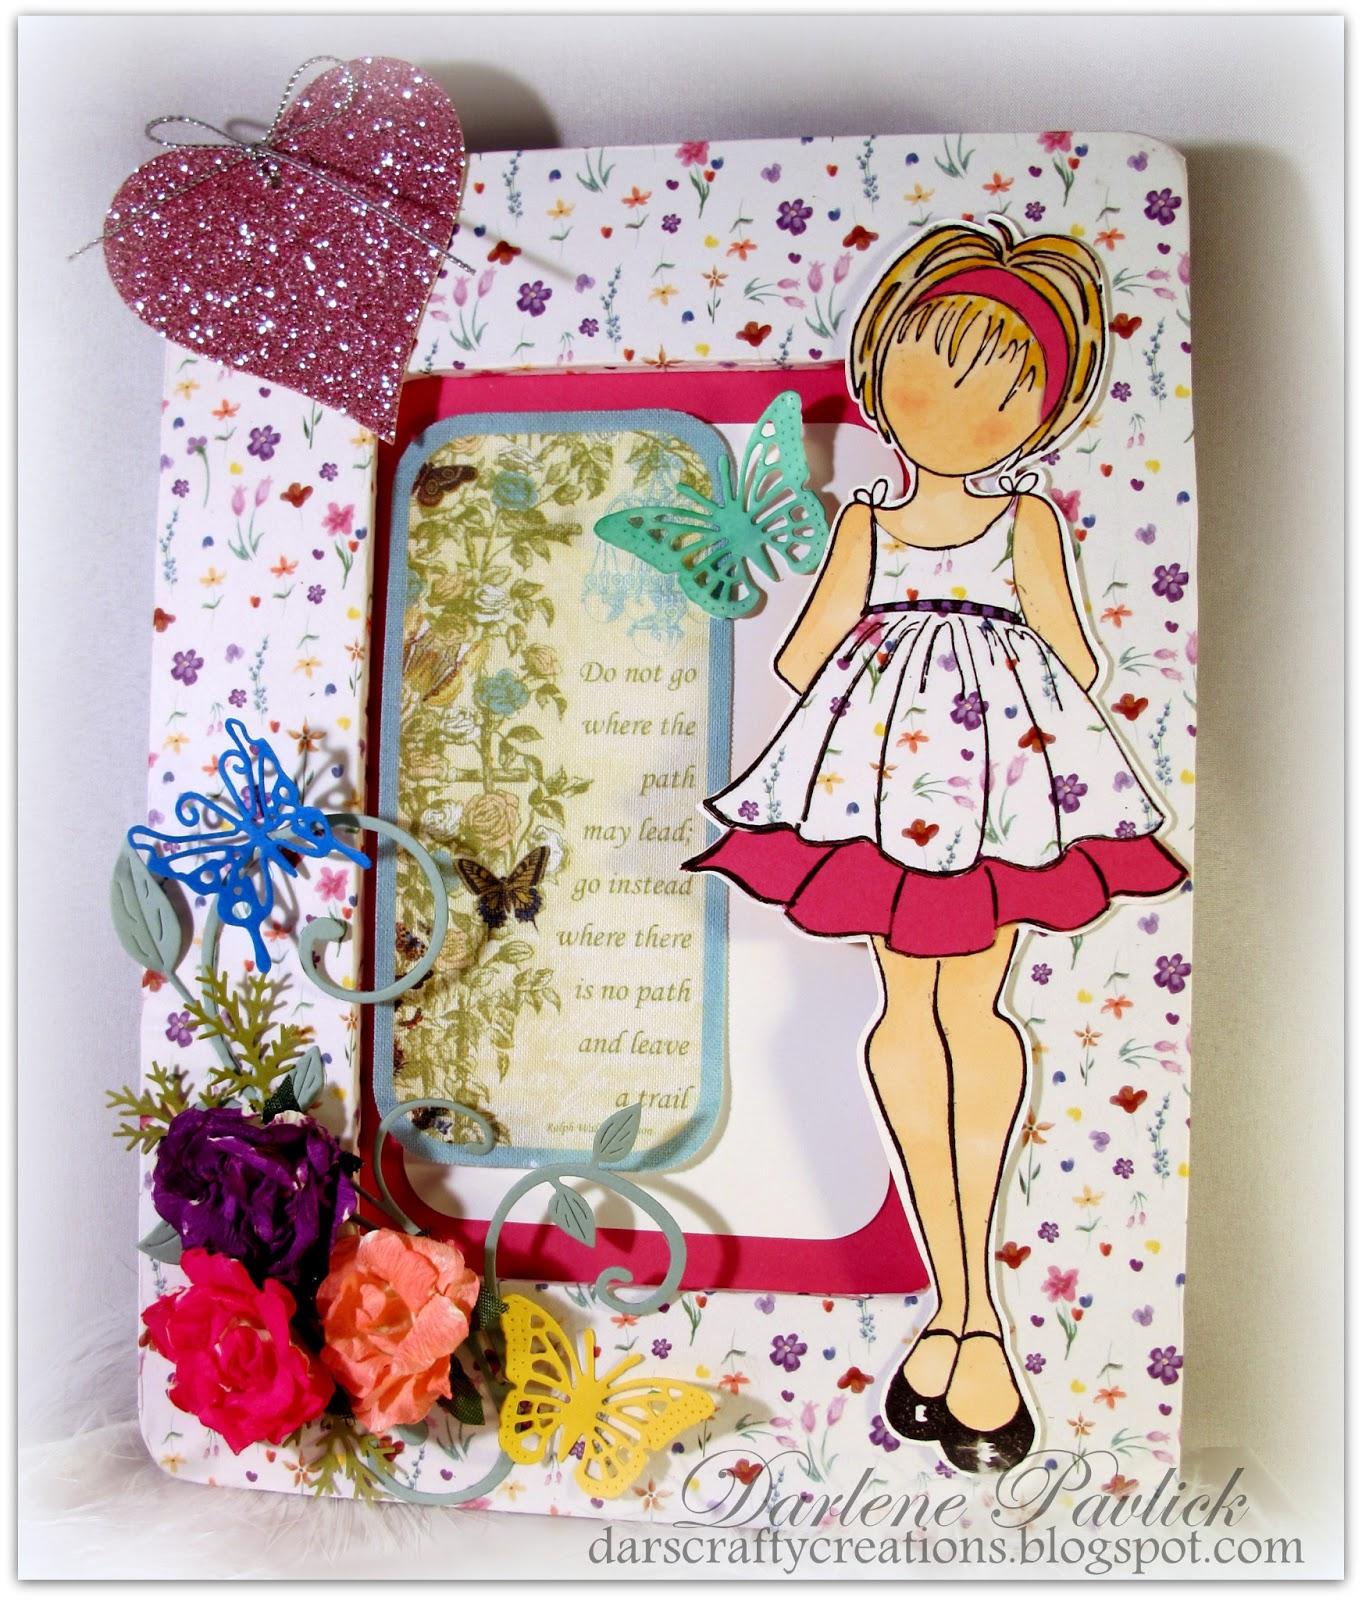 Dar's Crafty Creations: Prima - Julie Nutting Doll Hop ...